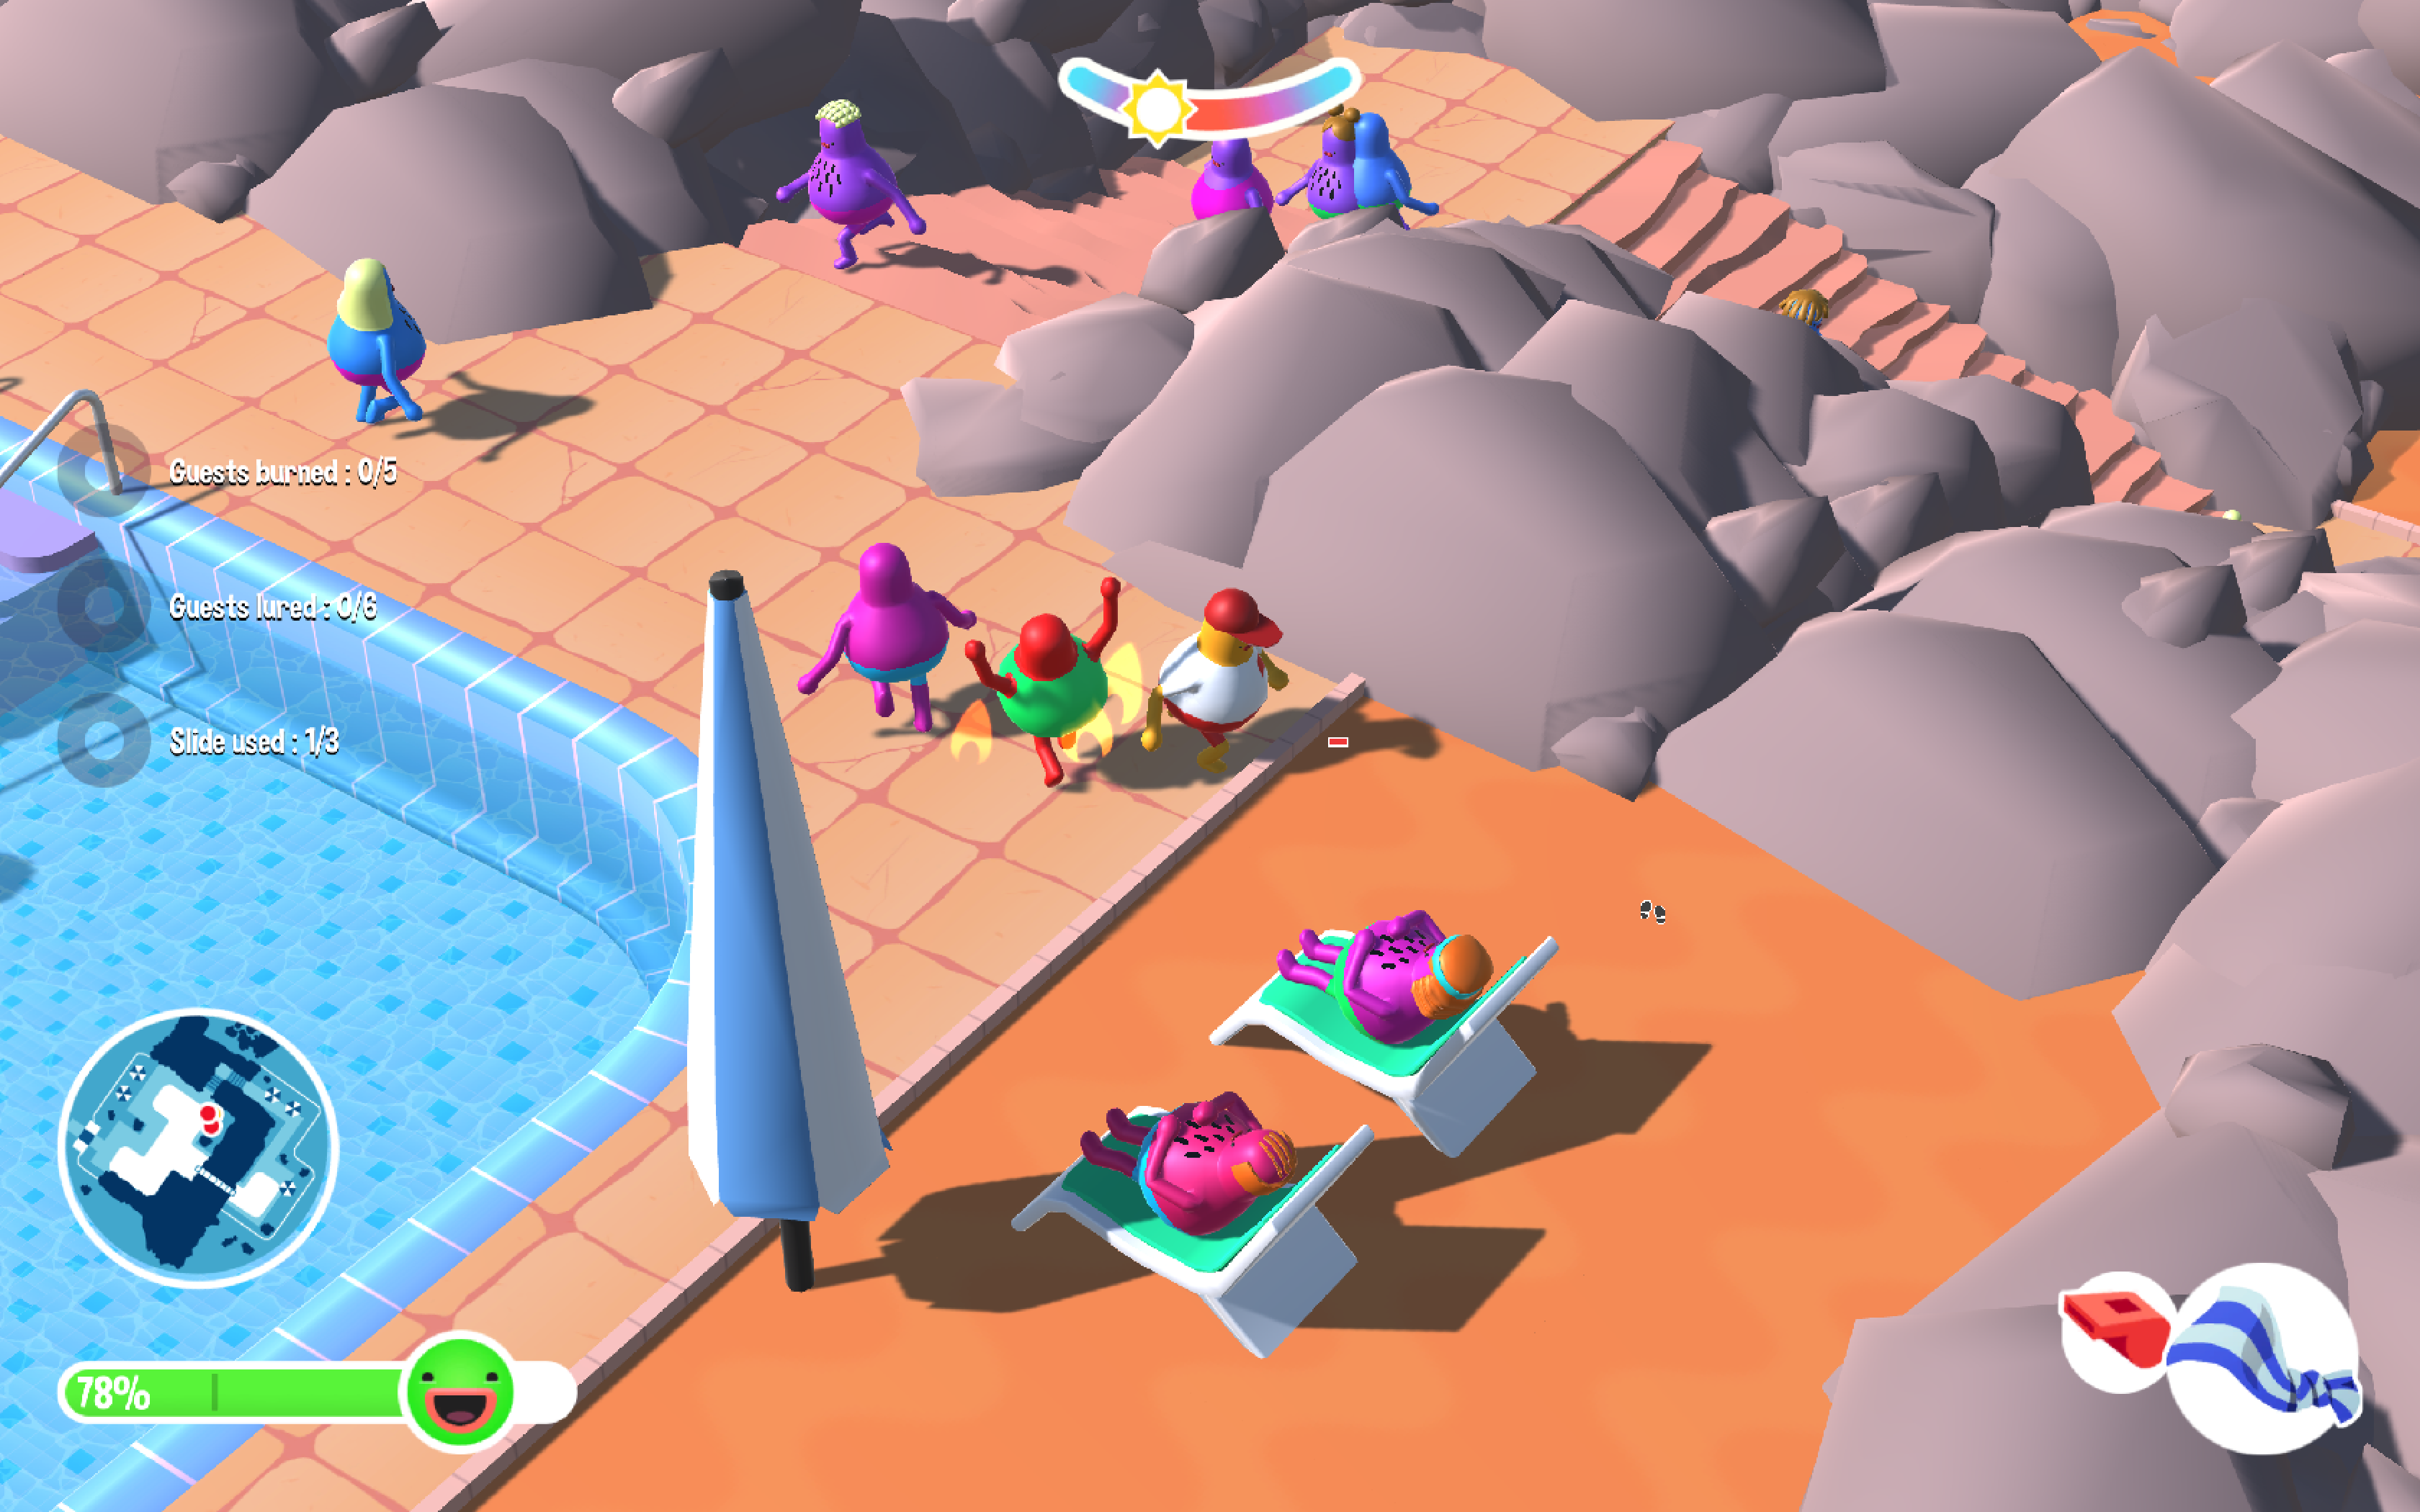 PoolPartyPanic_screenshot5.png